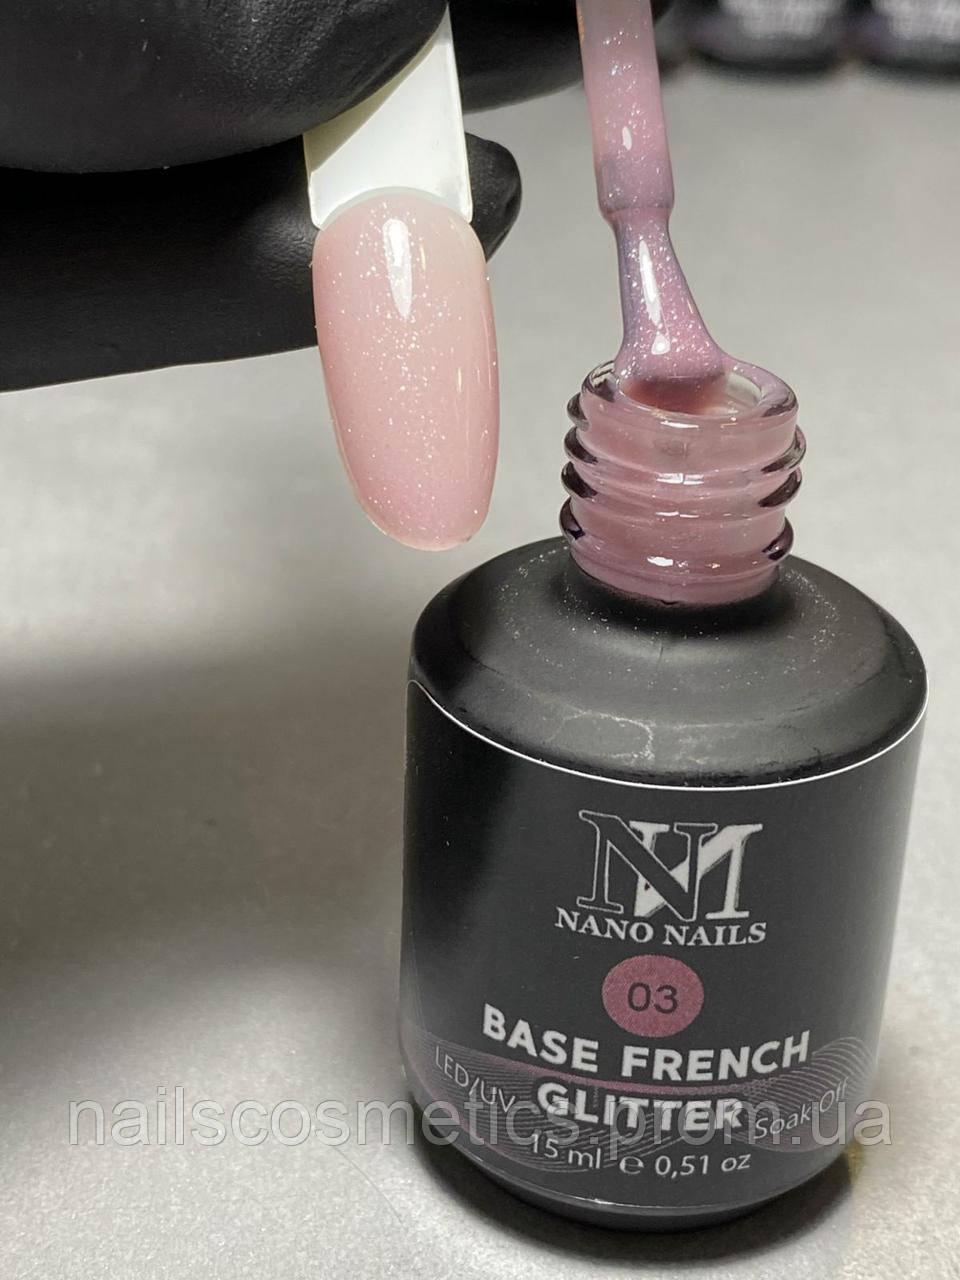 03 Base French glitter NANO NAILS, для гель-лака 14мл